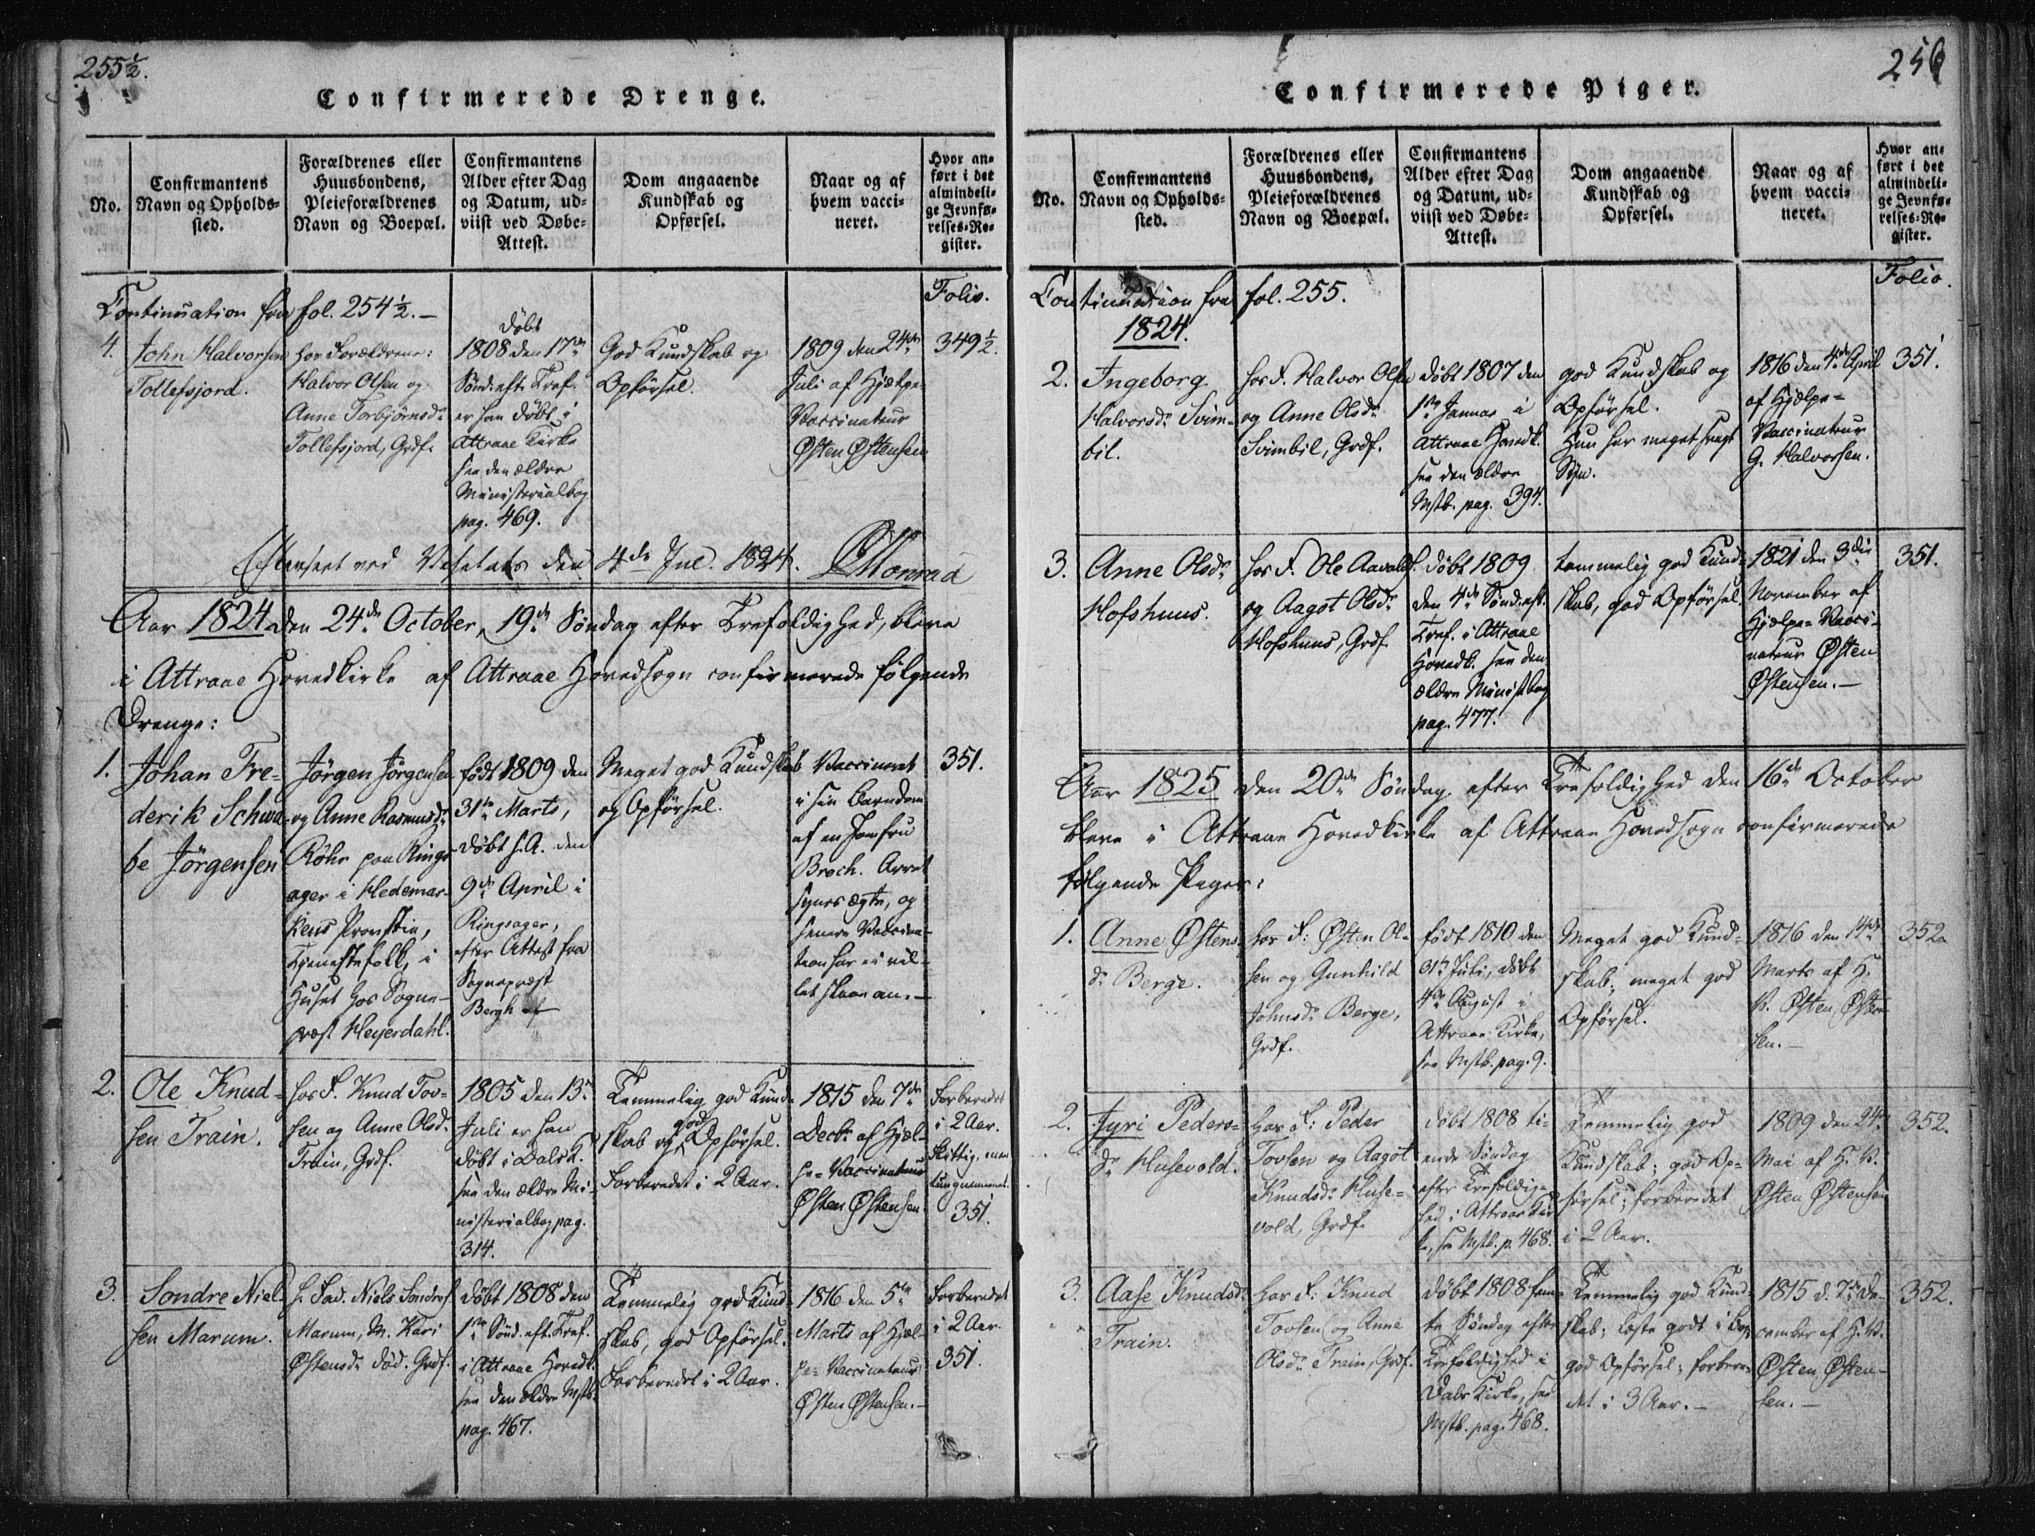 SAKO, Tinn kirkebøker, F/Fa/L0004: Ministerialbok nr. I 4, 1815-1843, s. 256